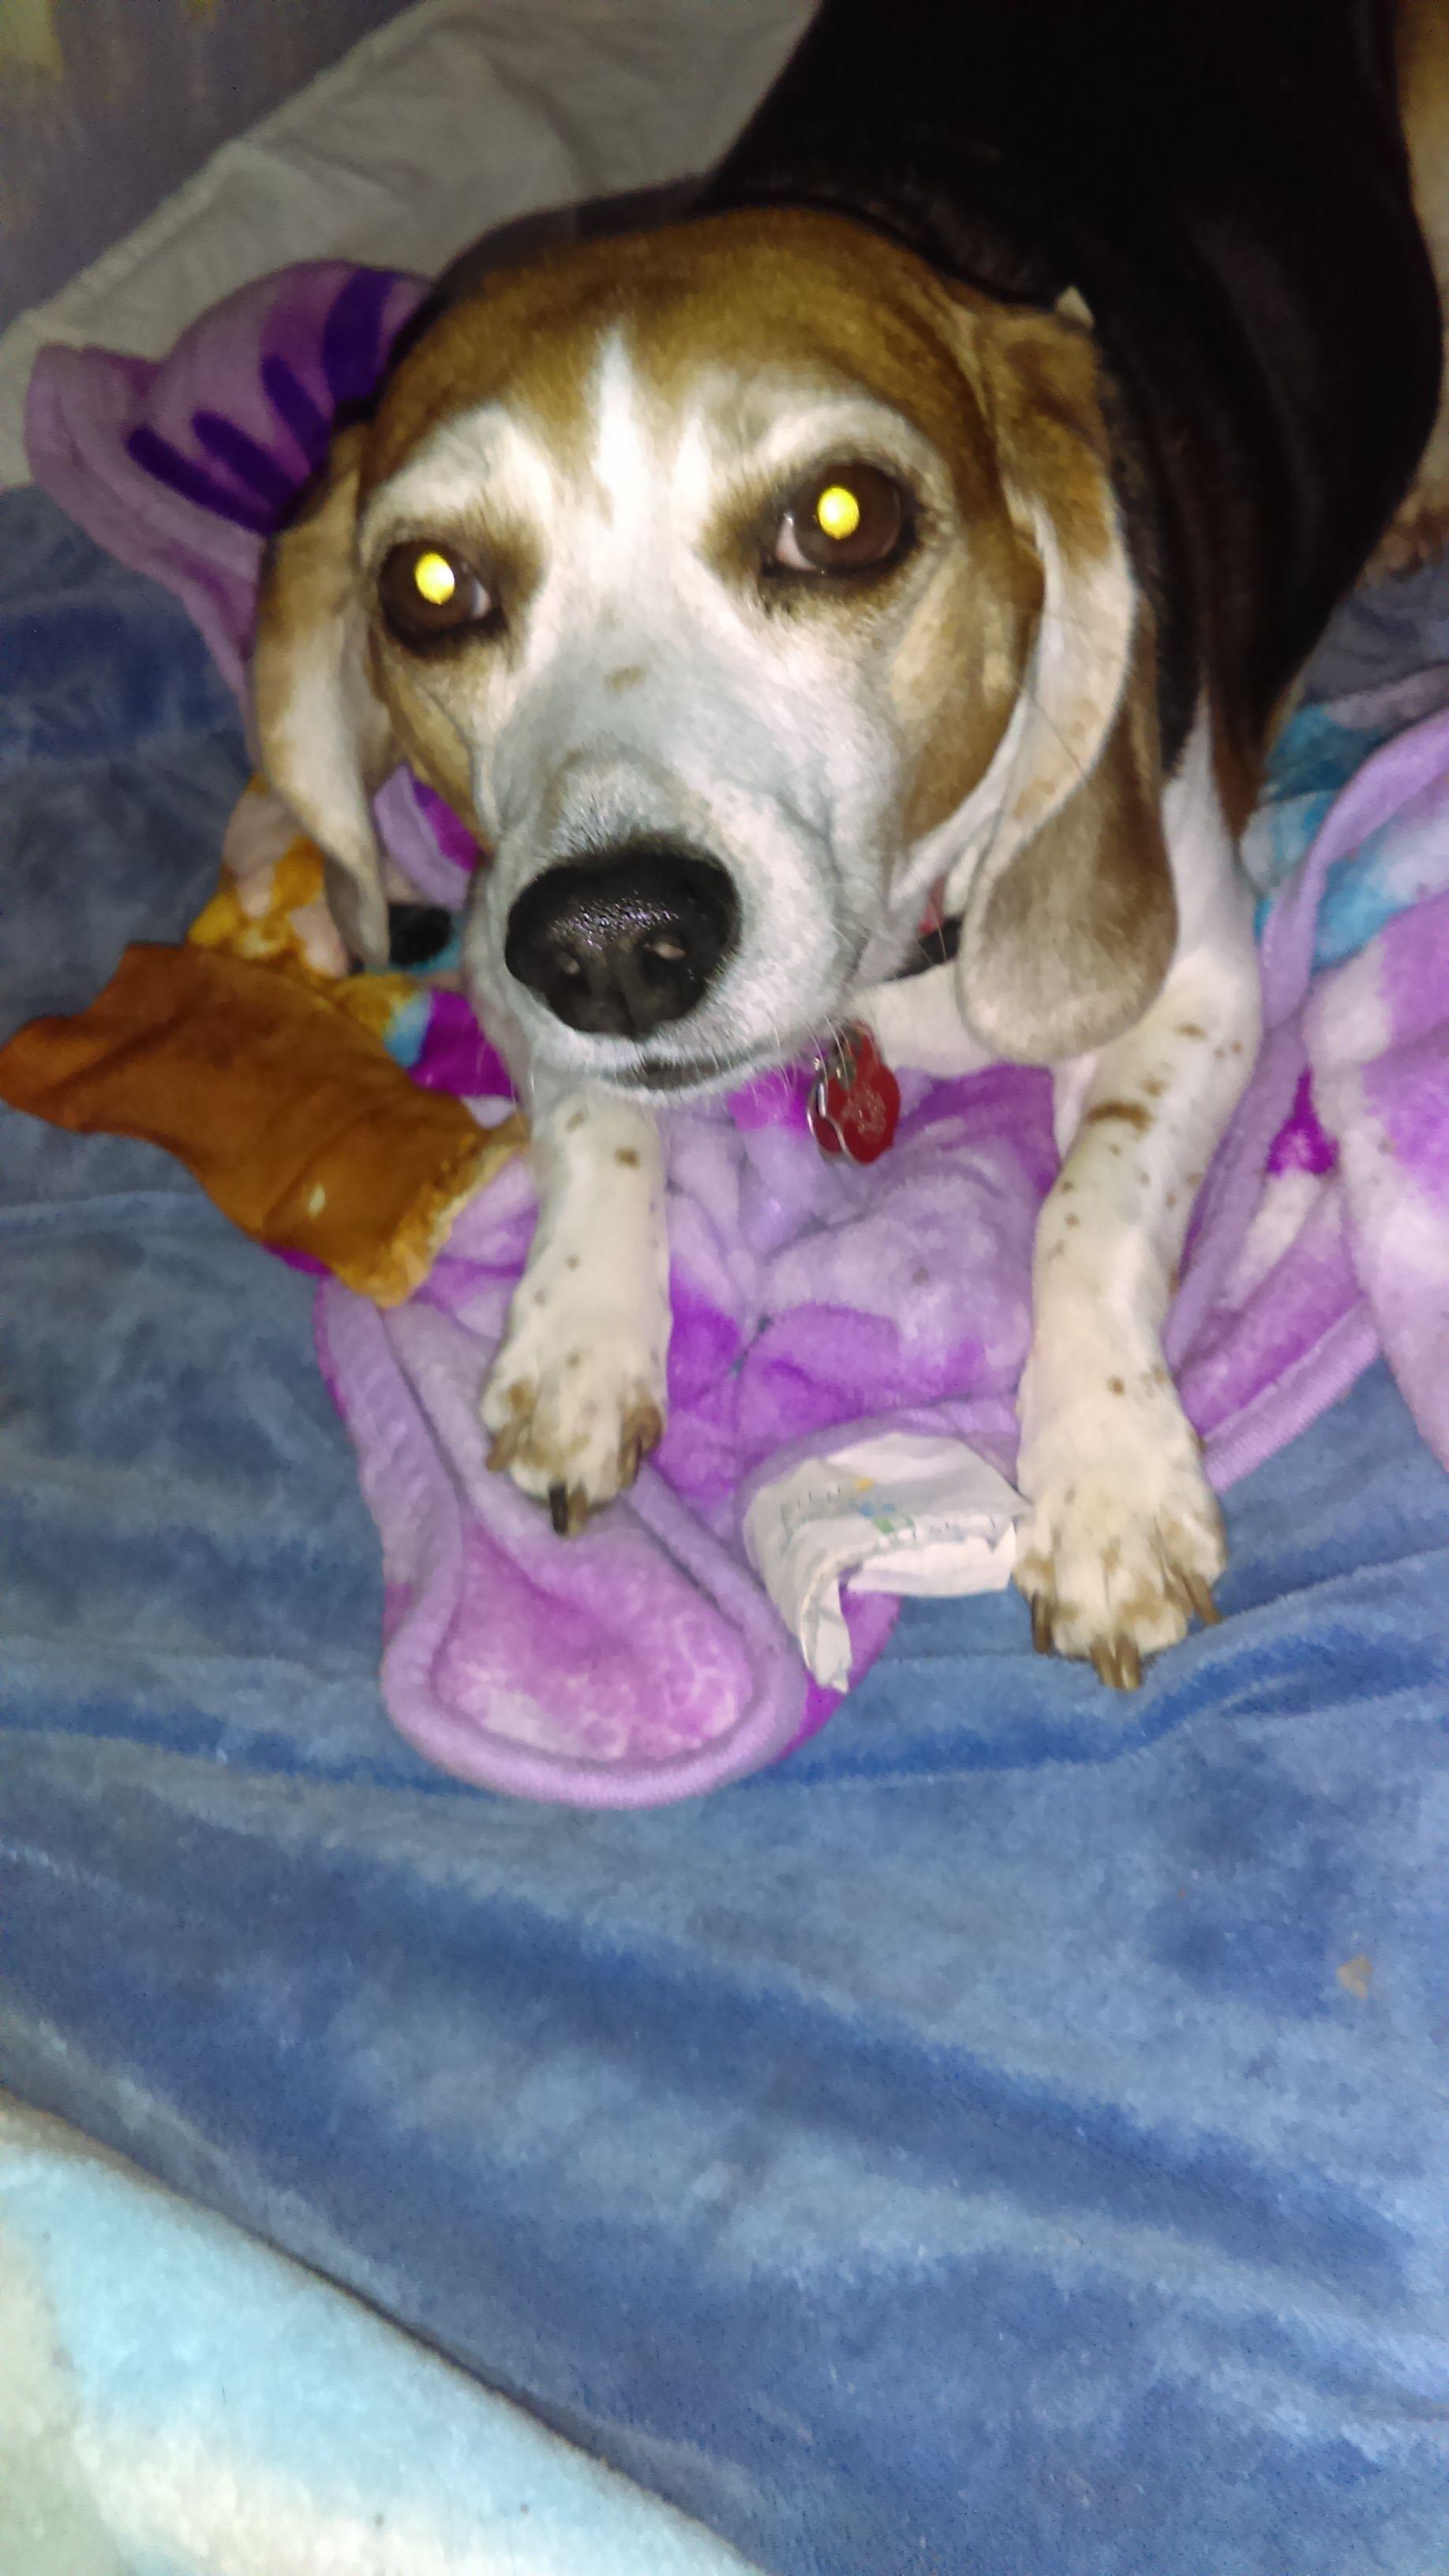 Beagle dog for Adoption in Tampa, FL. ADN772526 on